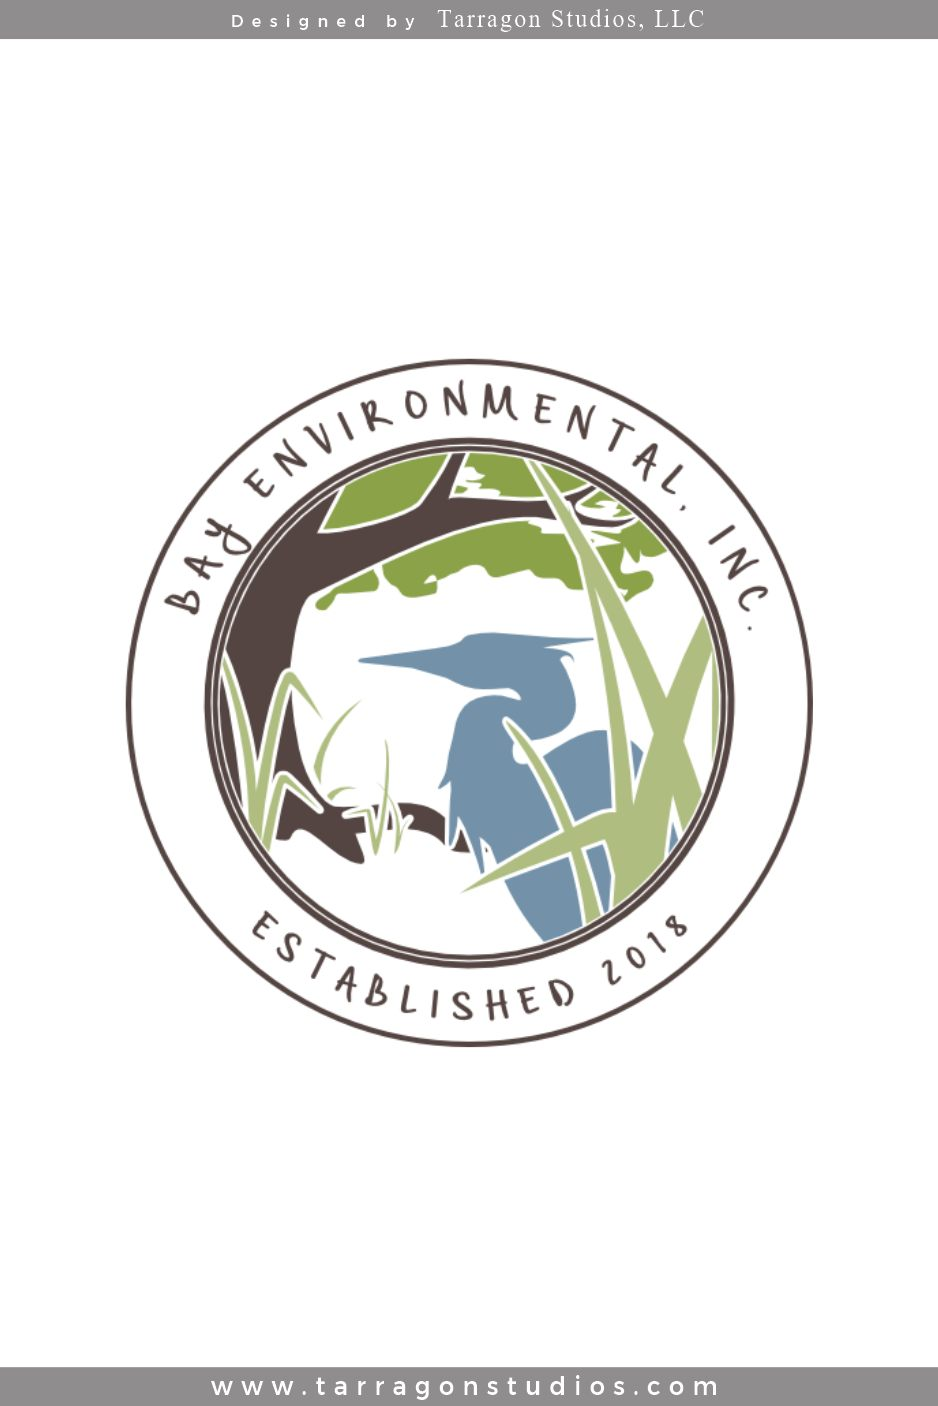 Bay Environmental Inc Logo Design by Tarragon Studios. Keep Reading to see all the logo variations! #logo #design #environment #masculine